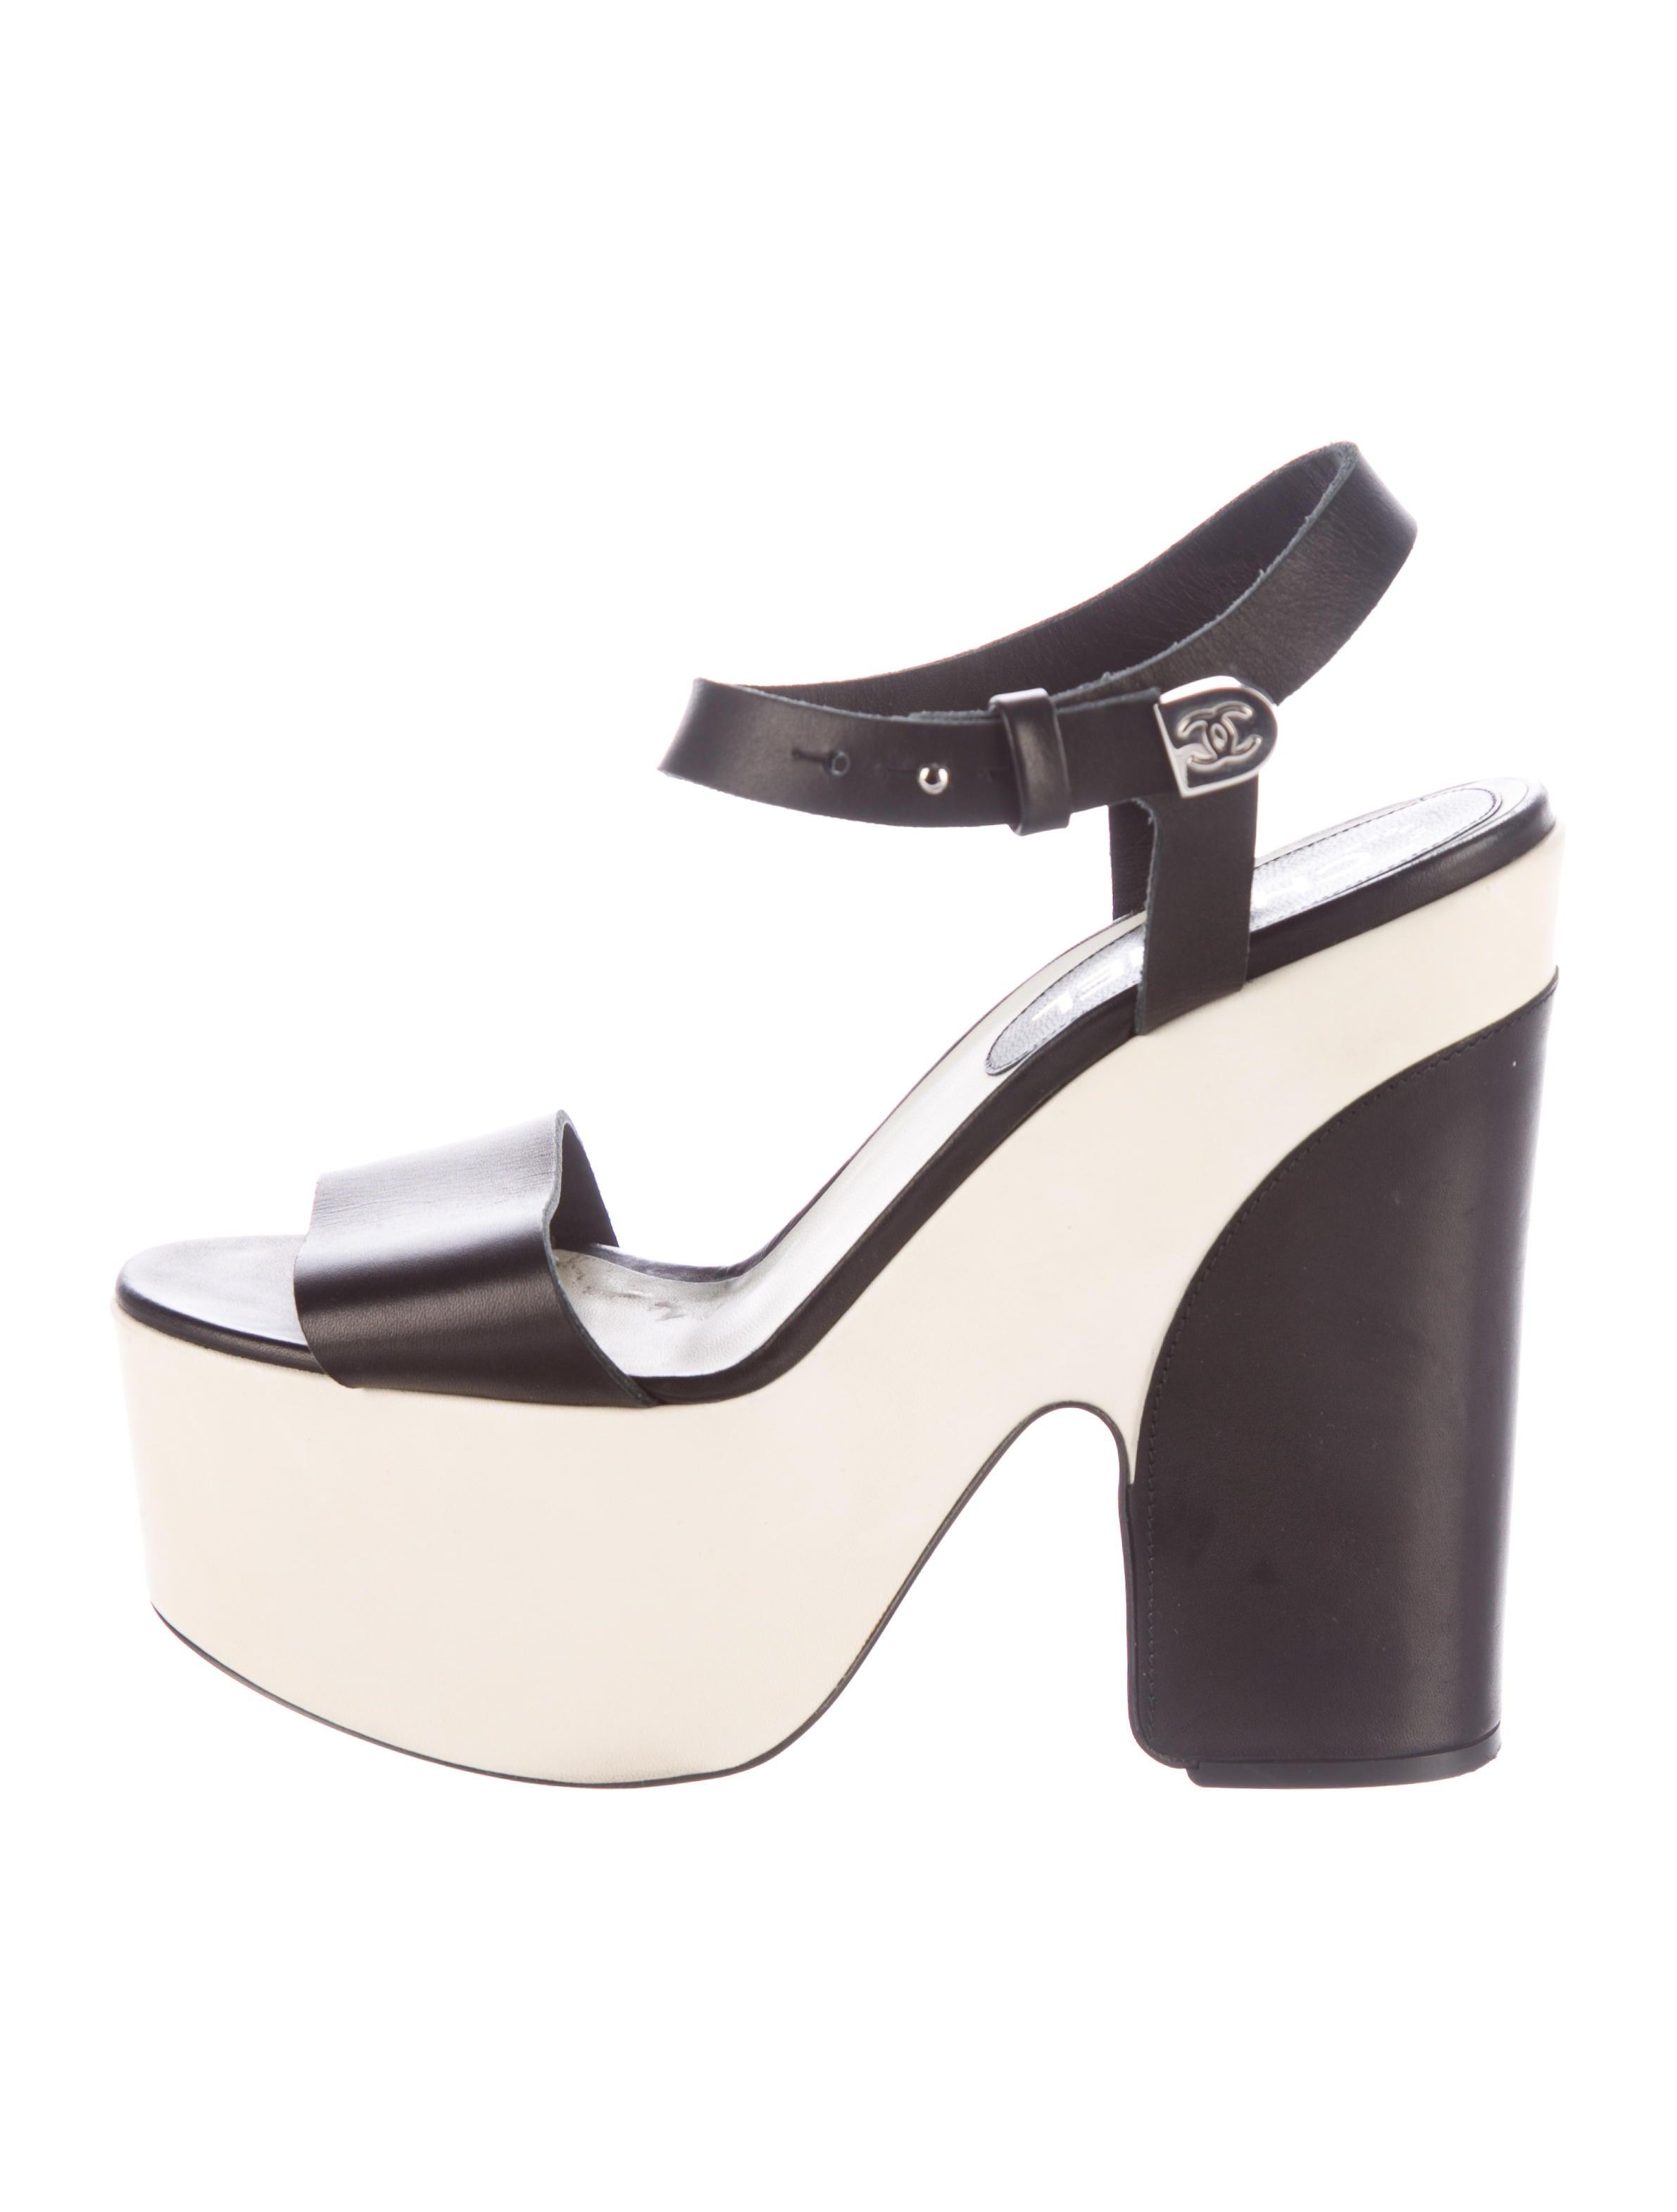 chanel leather platform ankle sandals shoes